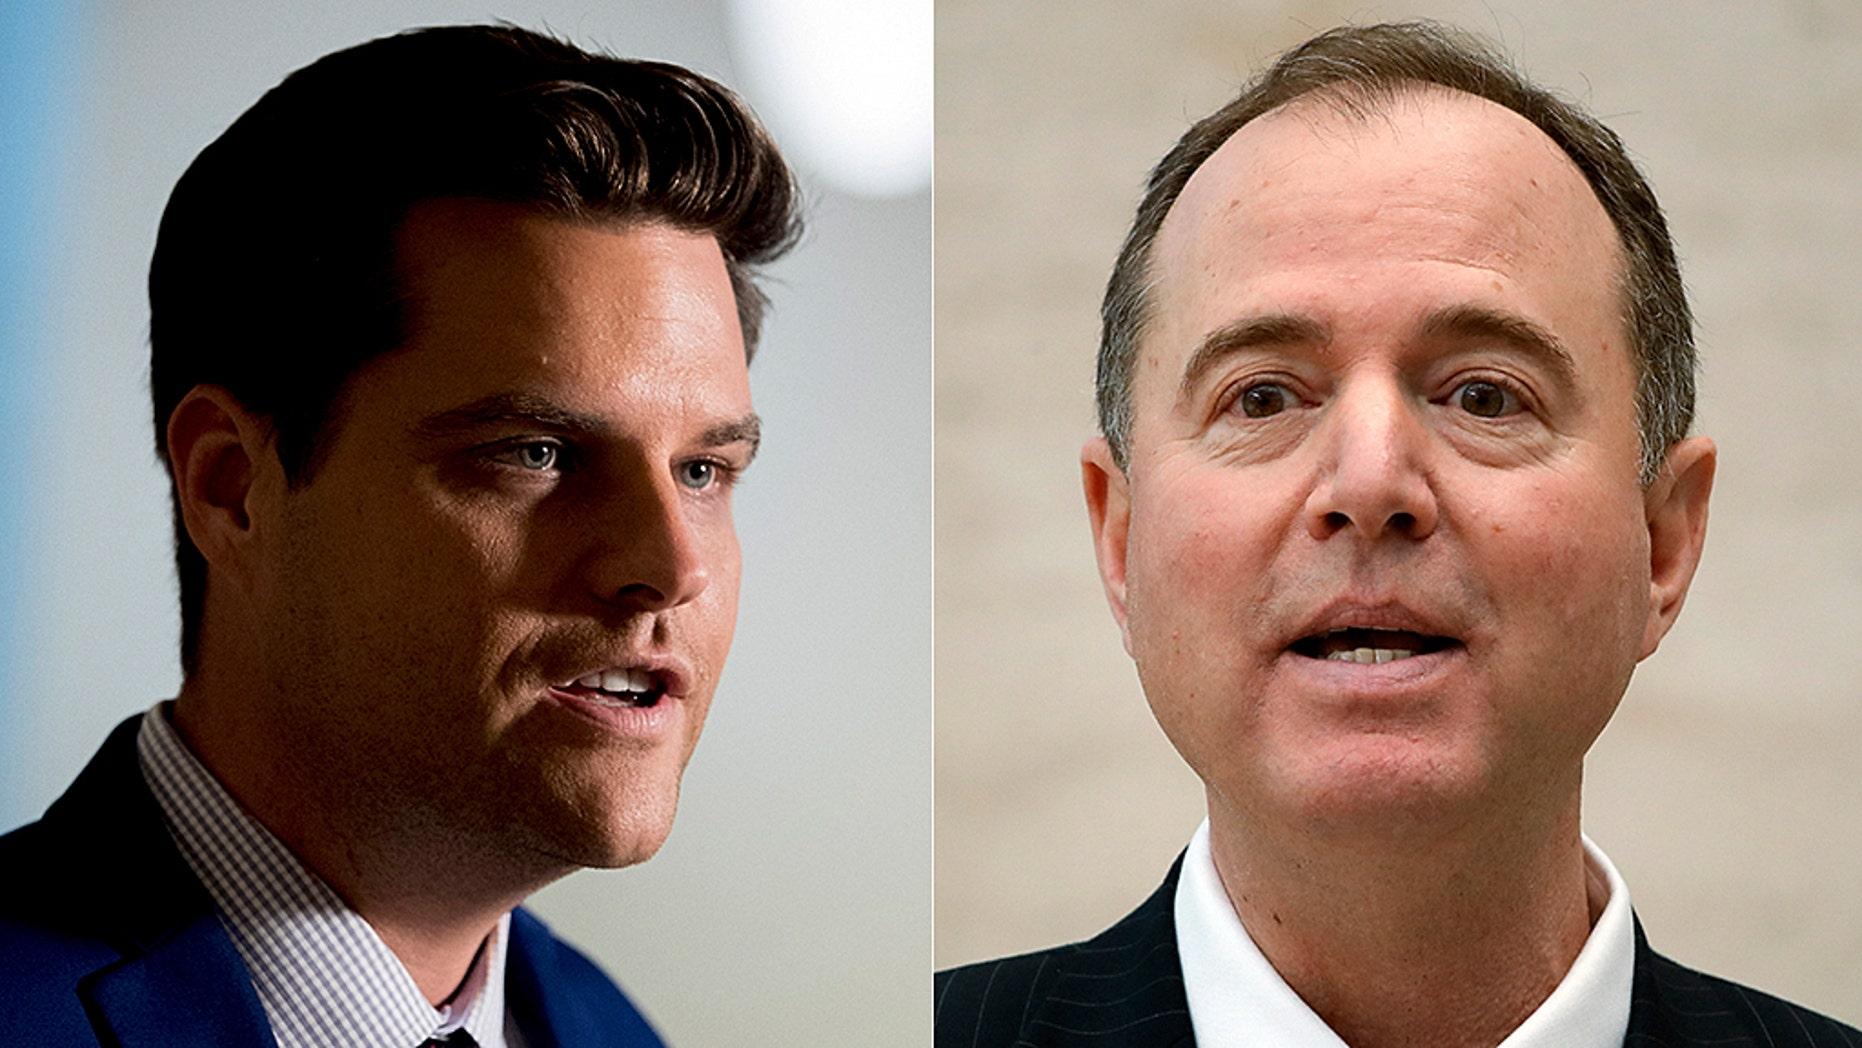 Rep. Matt Gaetz, R-Fla., (left) filed a formal ethics complaint against House Intelligence Committee Chairman Adam Schiff, D-Calif. (right.)